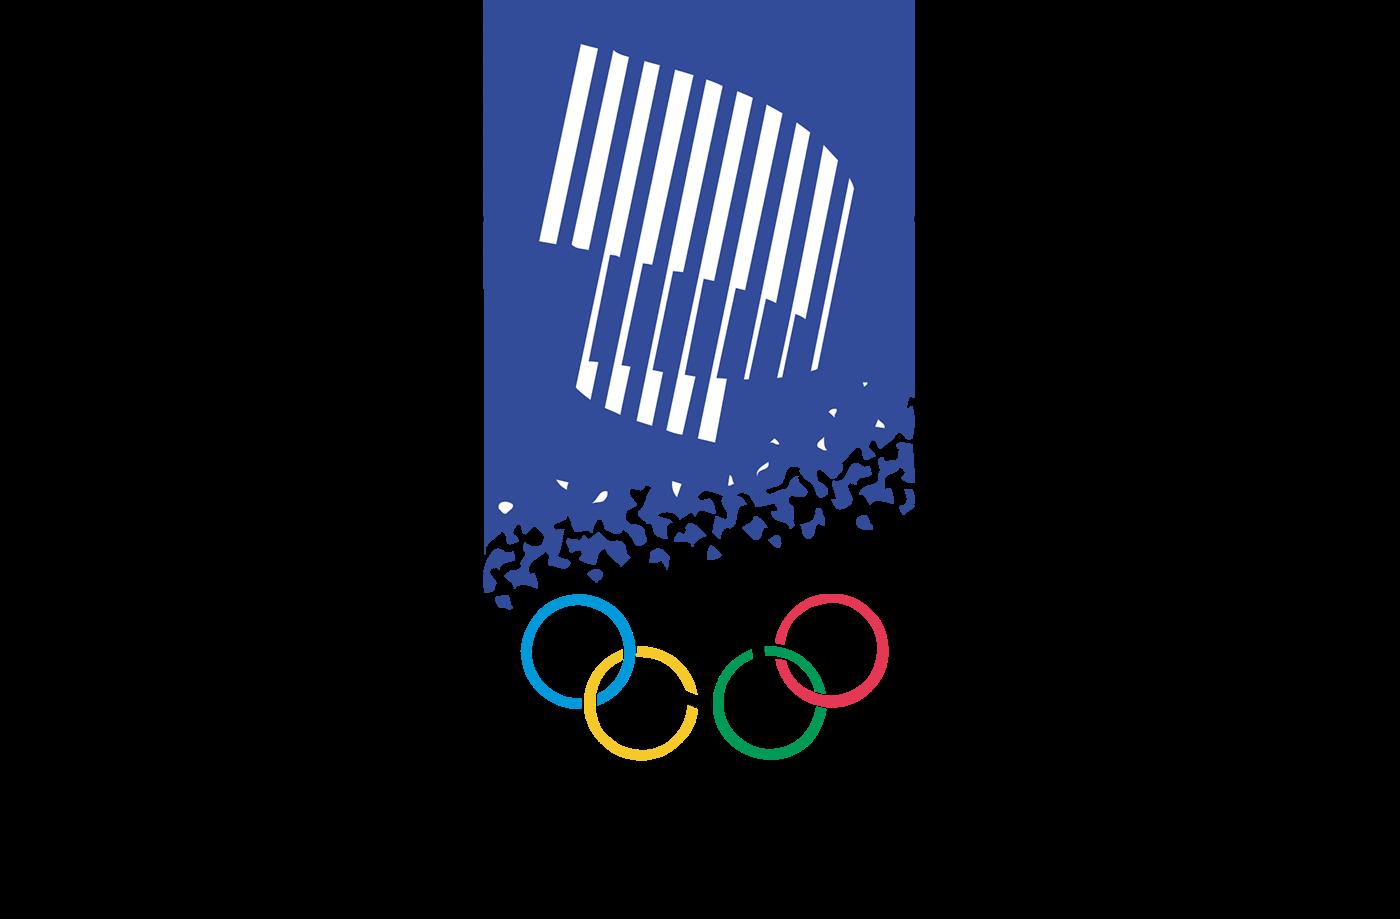 Lillehammer – Jeux olympiques d'hiver 1994